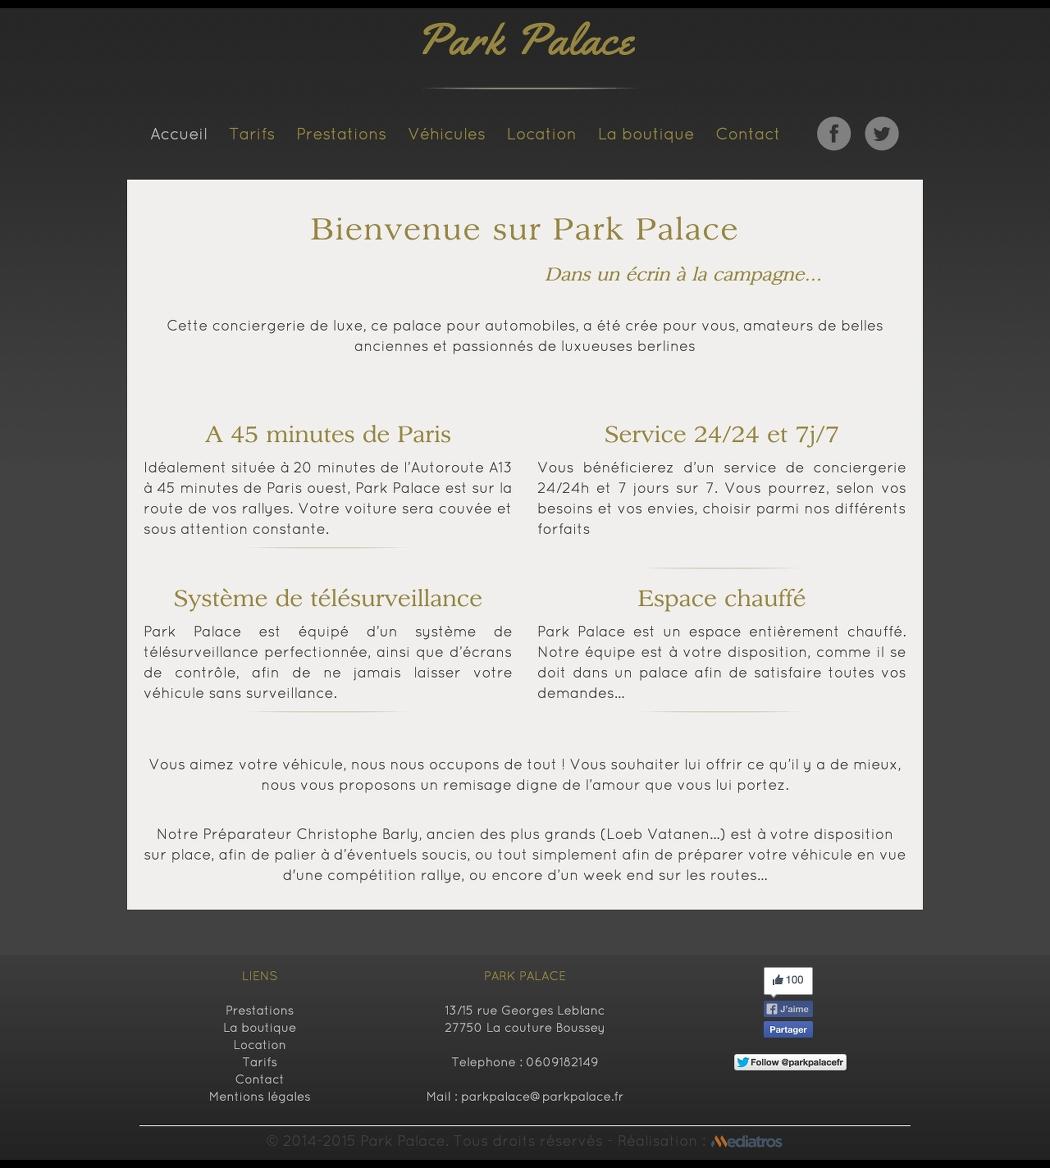 ParkPalace-Mediatros